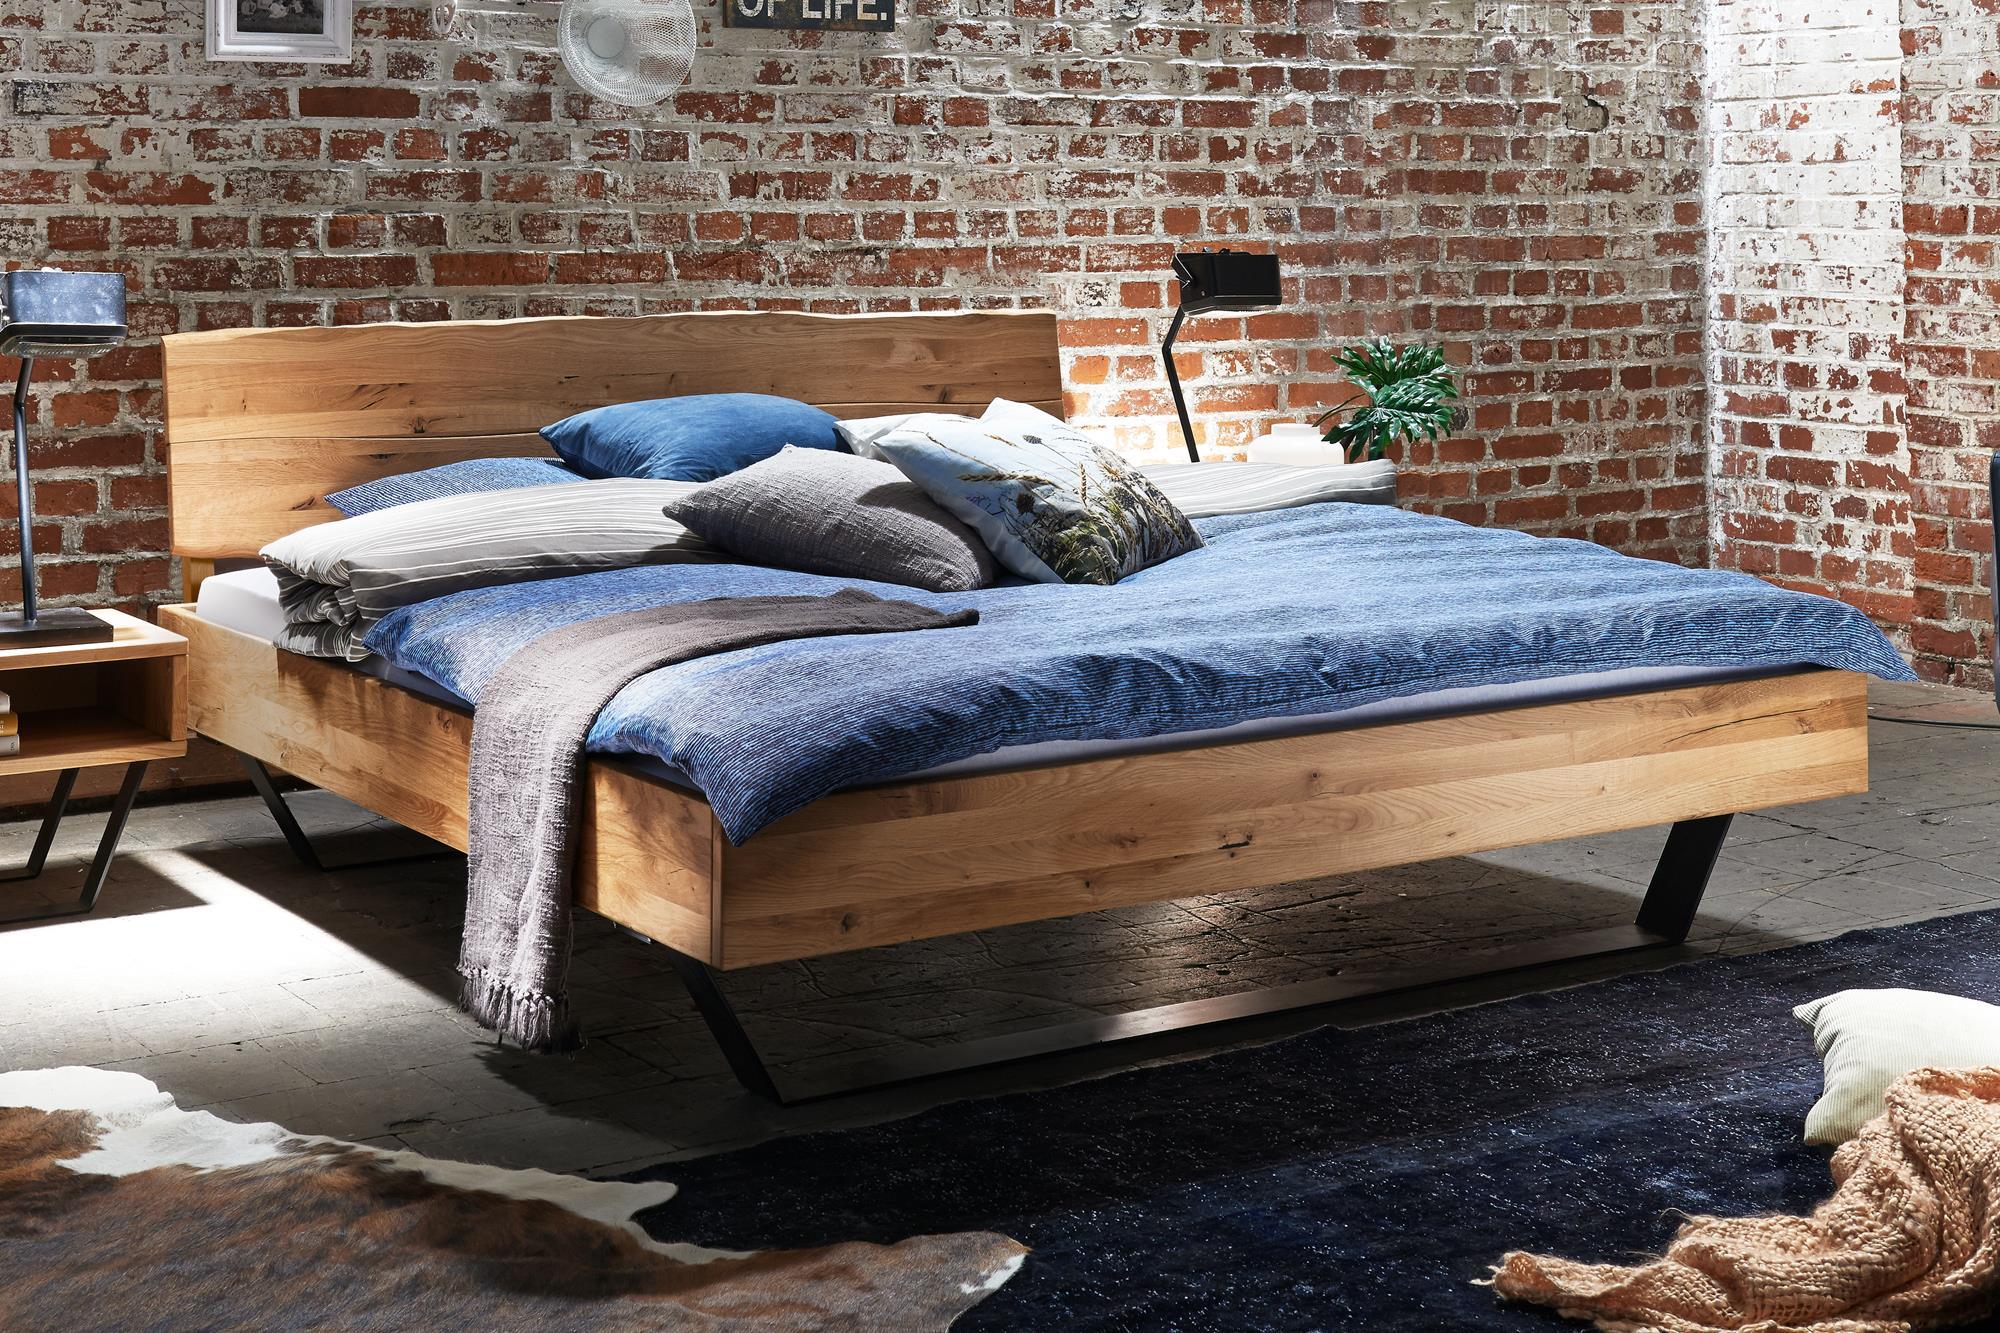 Full Size of Bett Modern Leader Italienisches Design Puristisch Sleep Better Beyond Pillow 140x200 Tjoernbo Baumkante Mit Aufbewahrung Schlicht Betten Massivholz 180x200 Wohnzimmer Bett Modern